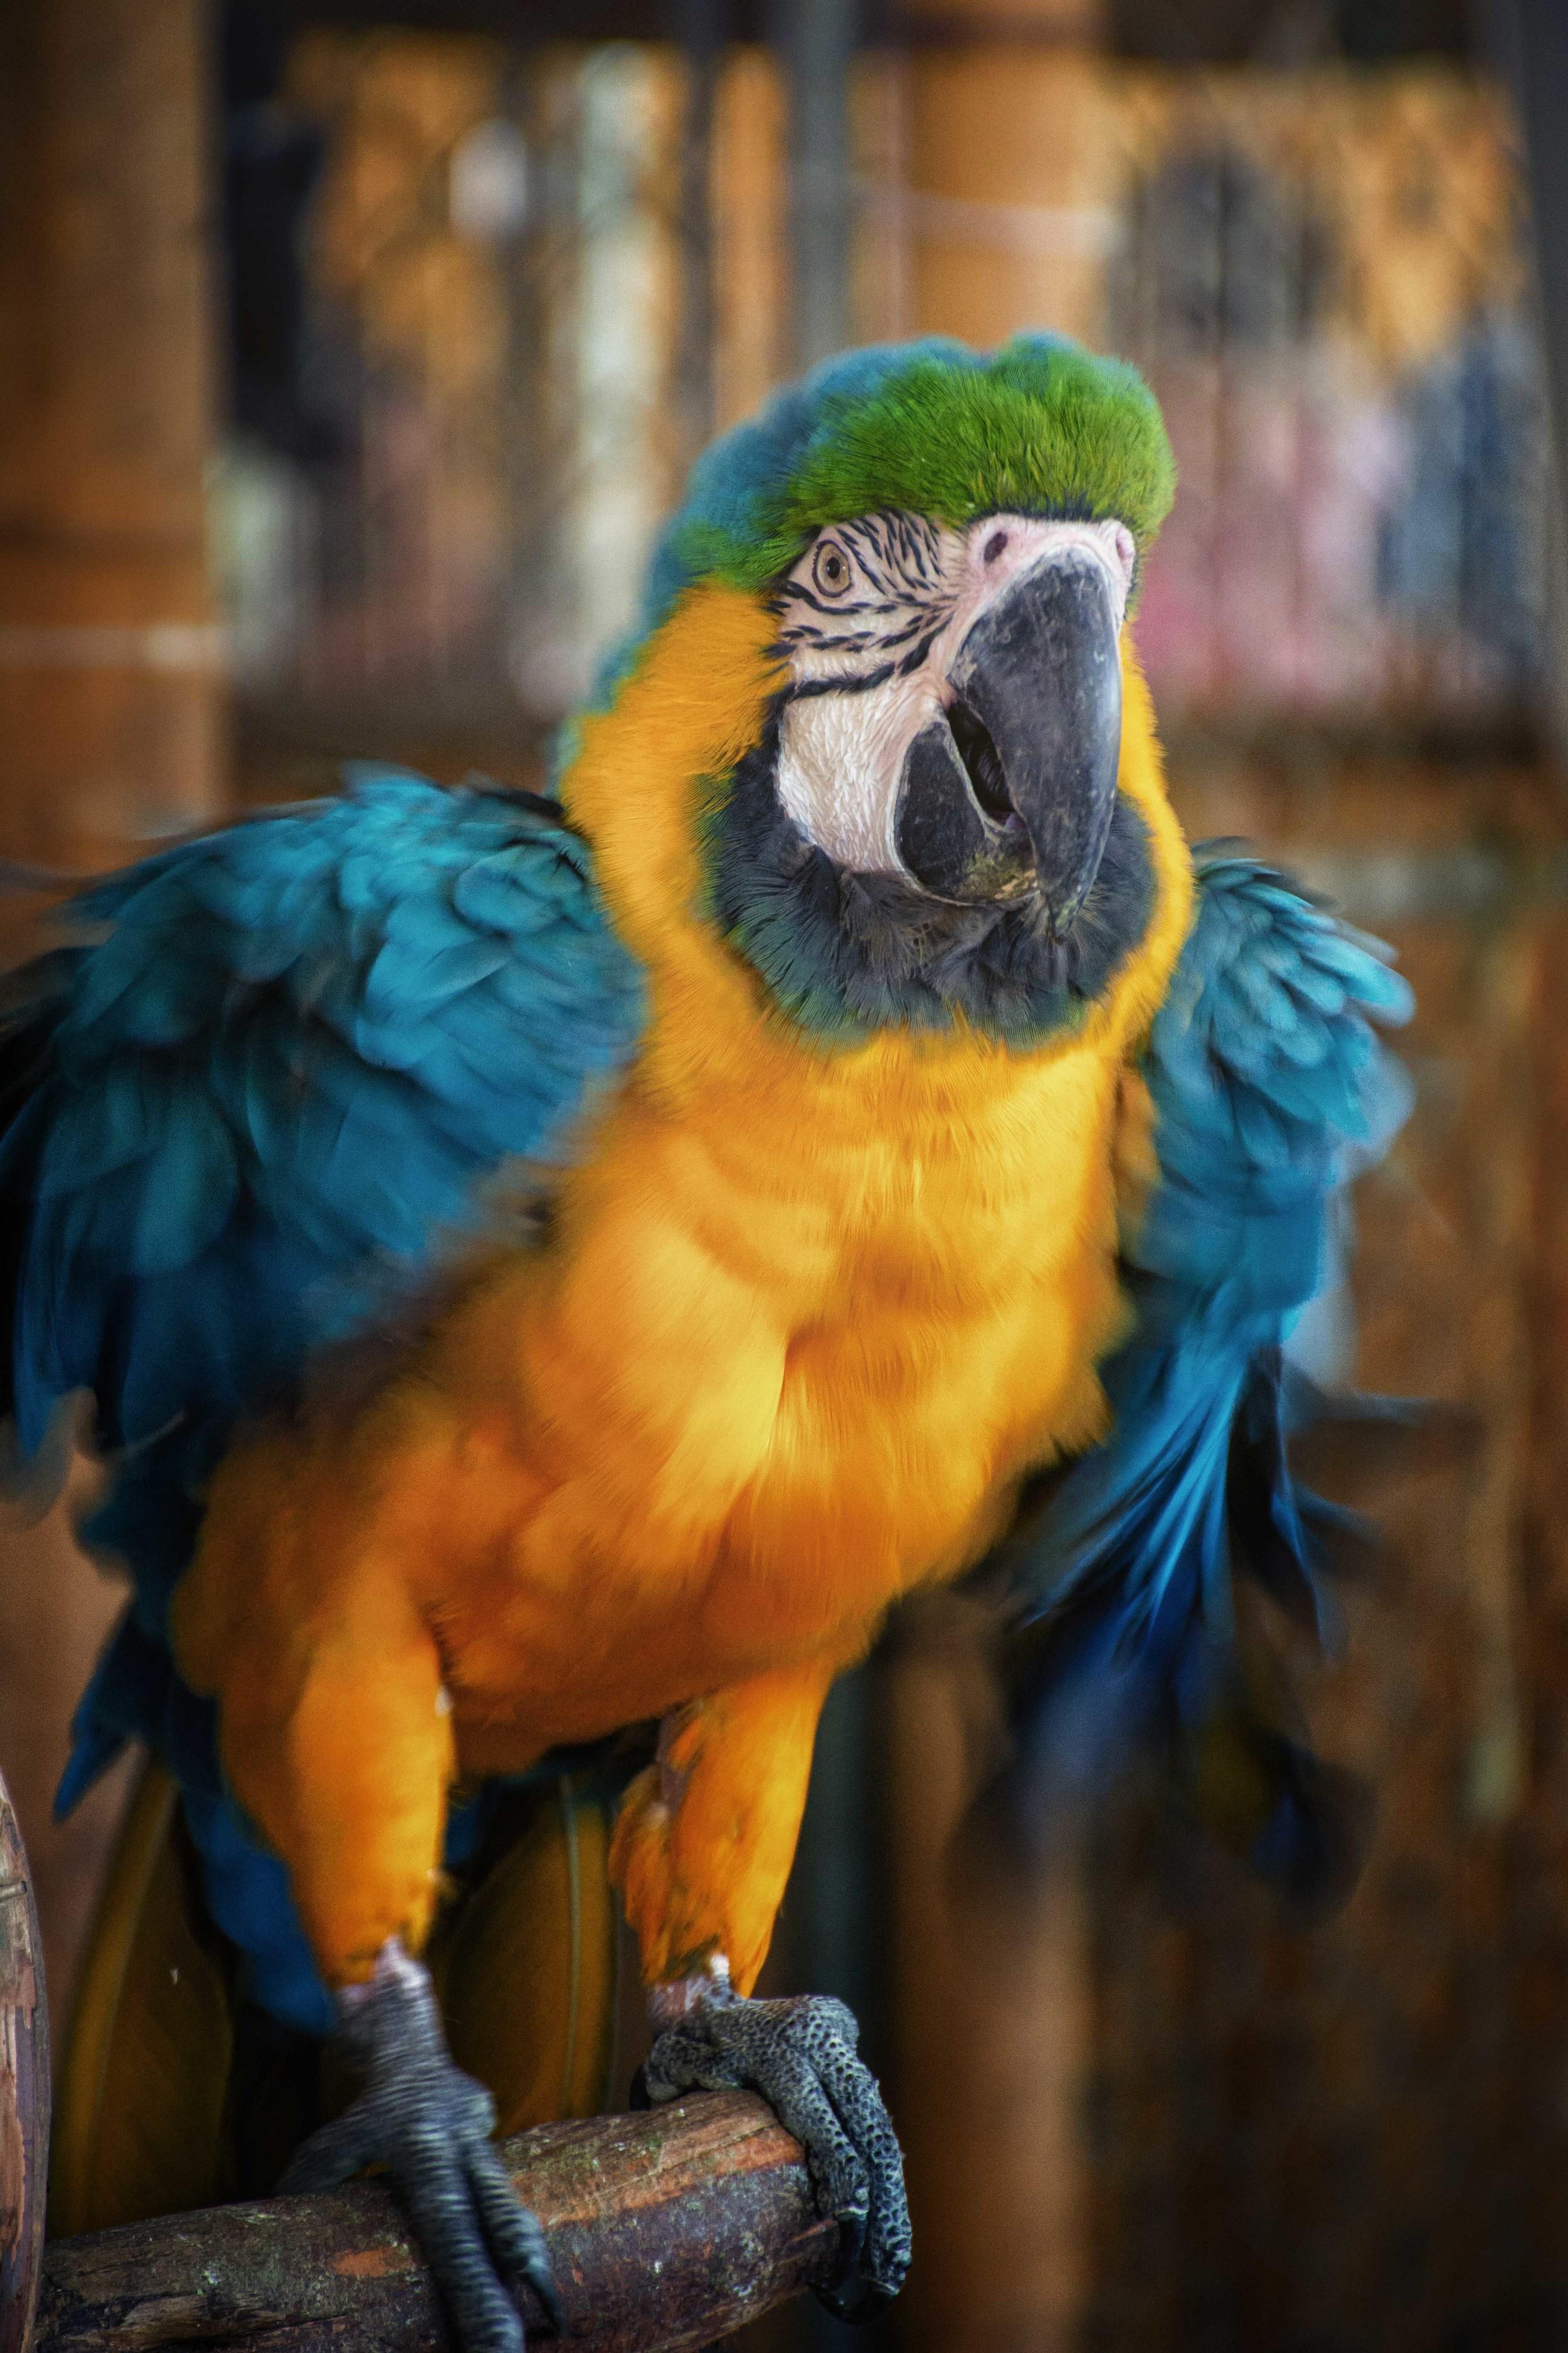 pretty bird sm.jpg